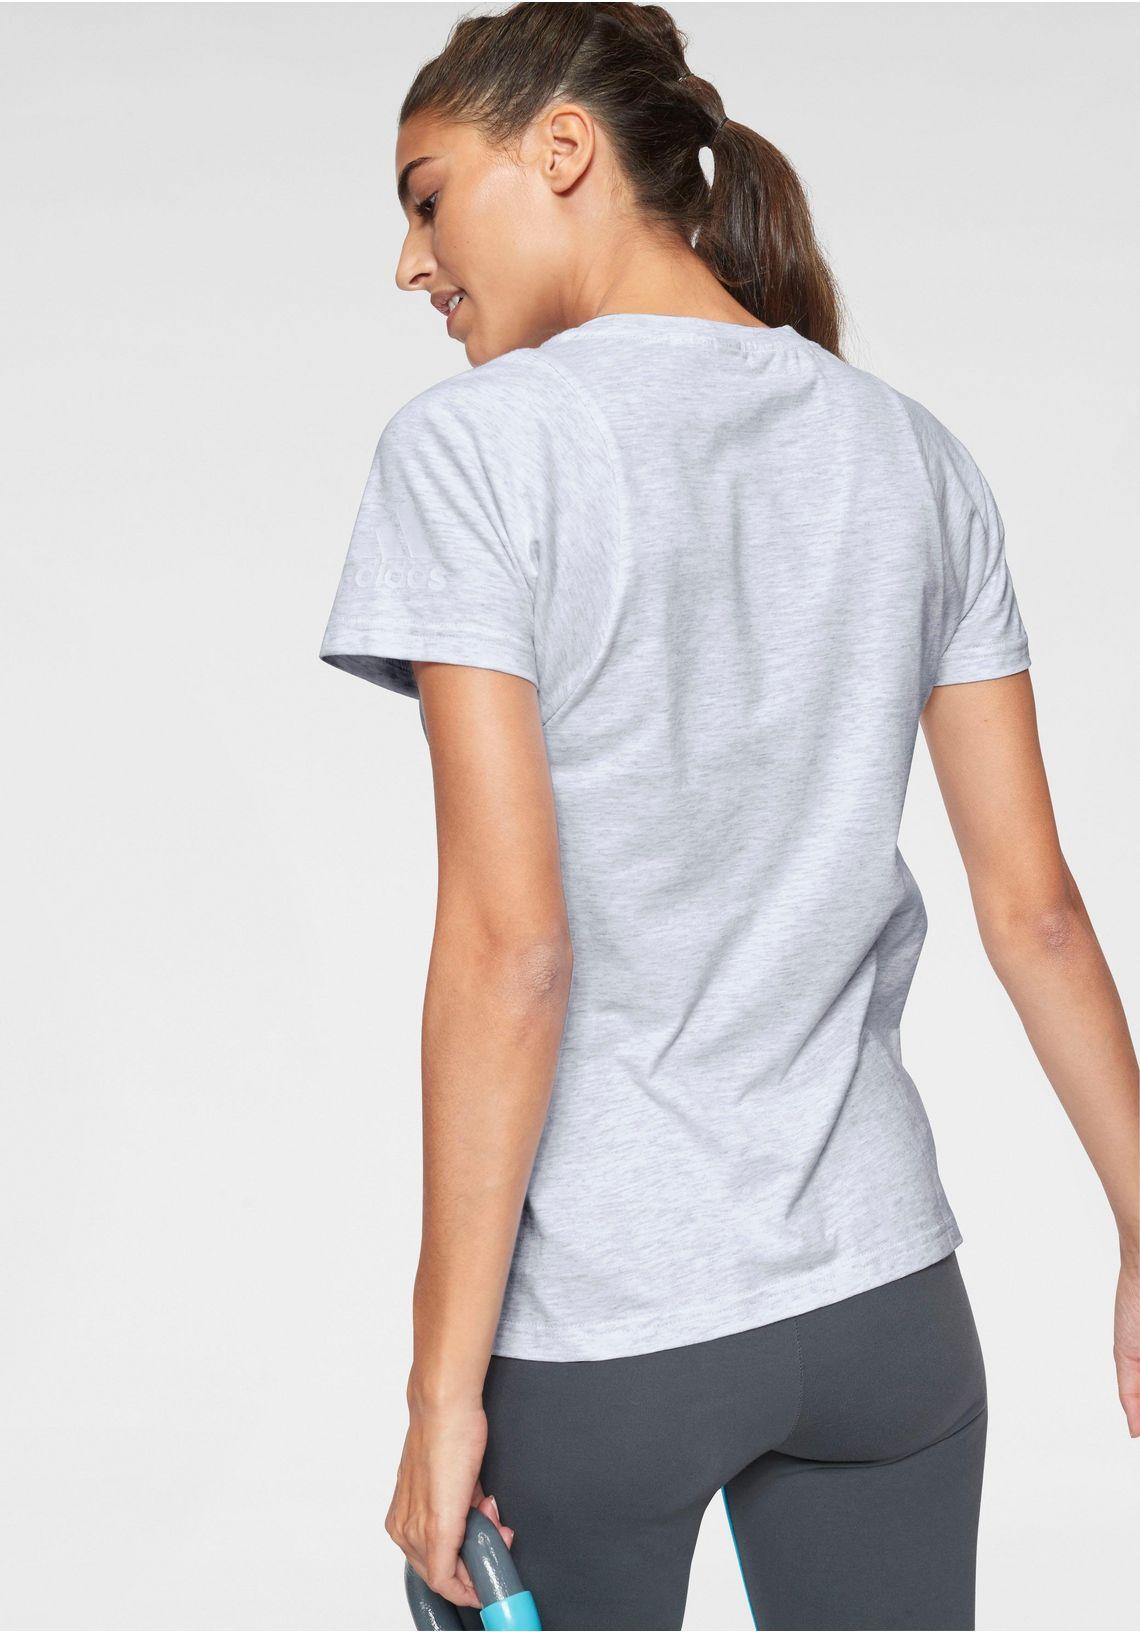 Adidas Performance T-shirt Id Winnes Cn-tee Online Shoppen Wit luJx6Rix